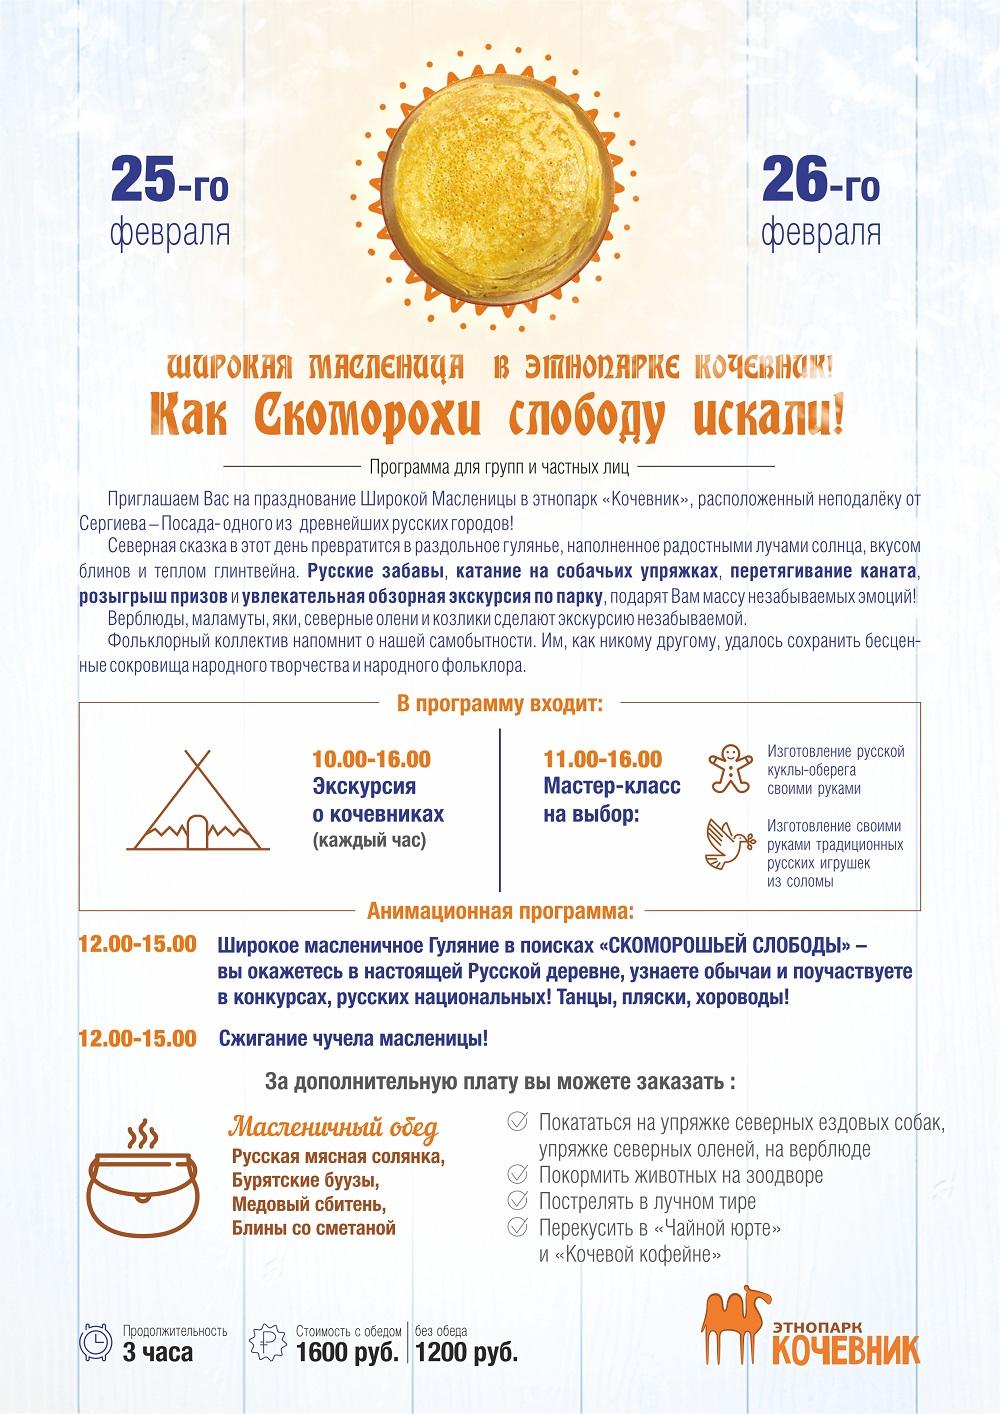 maslenica_programma_2-1